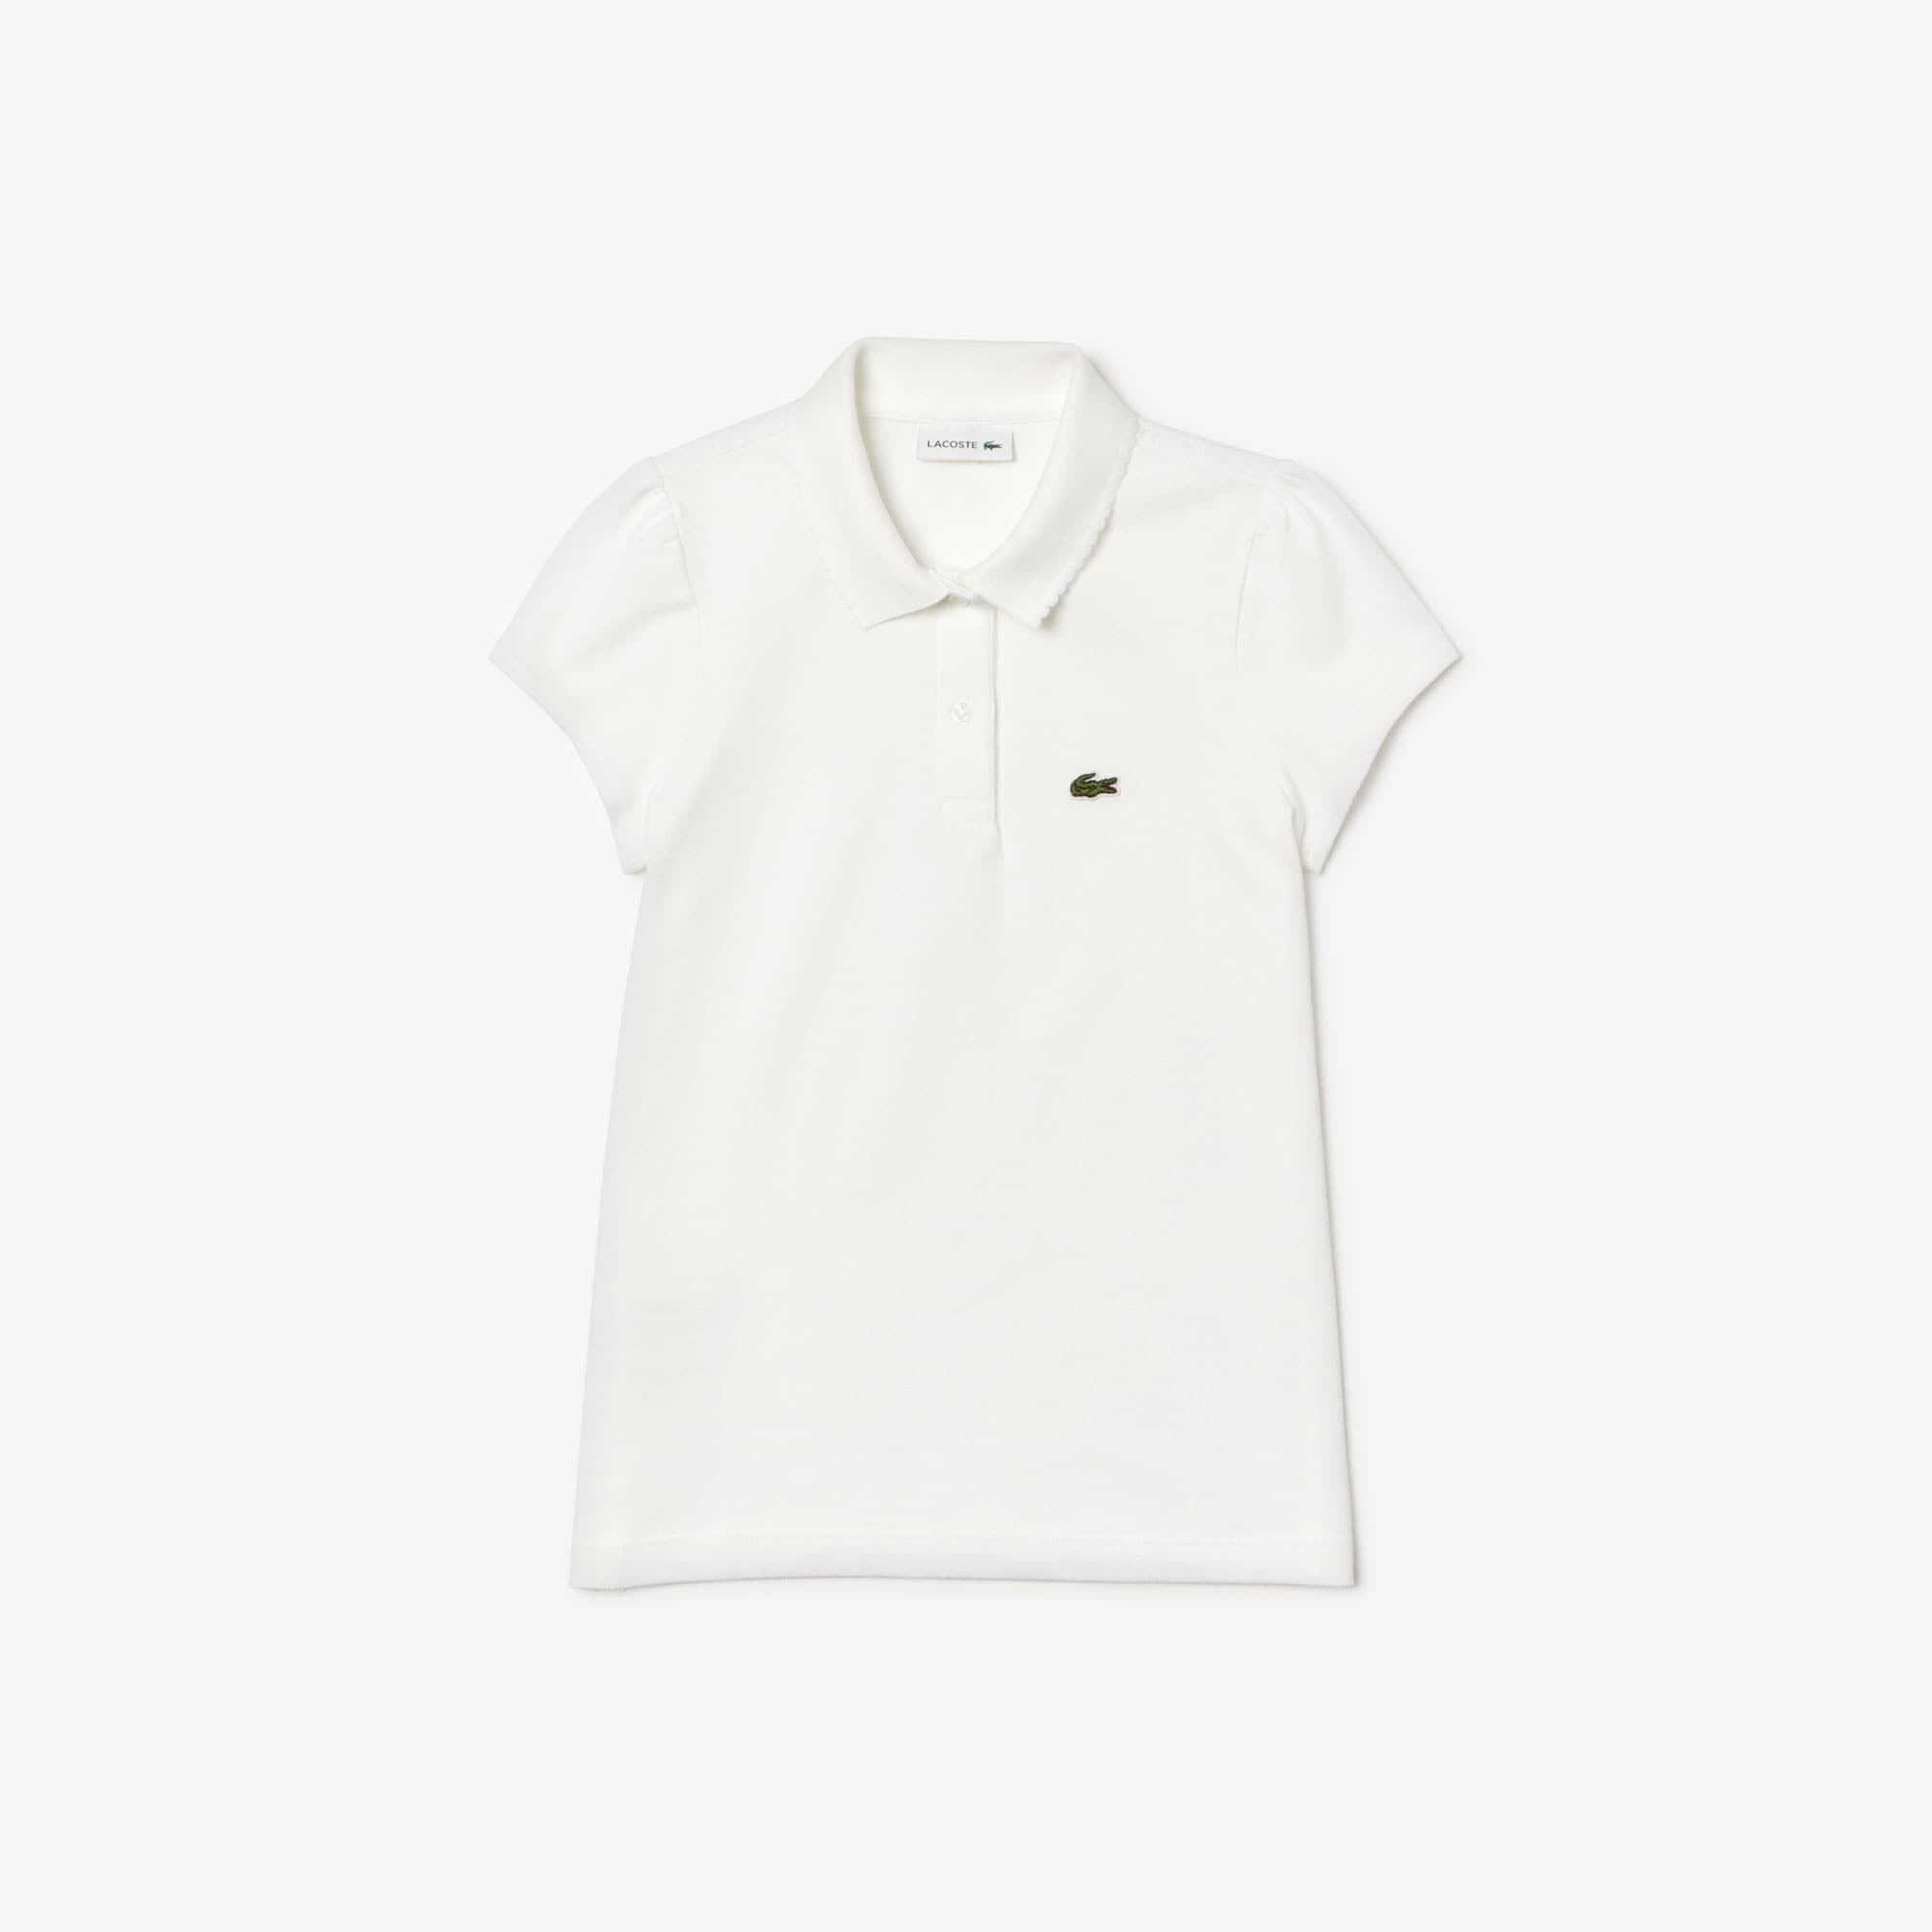 Camisa Polo Lacoste Feminina Infantil em Minipiquet com Gola Recortada 11ffc1cfd7